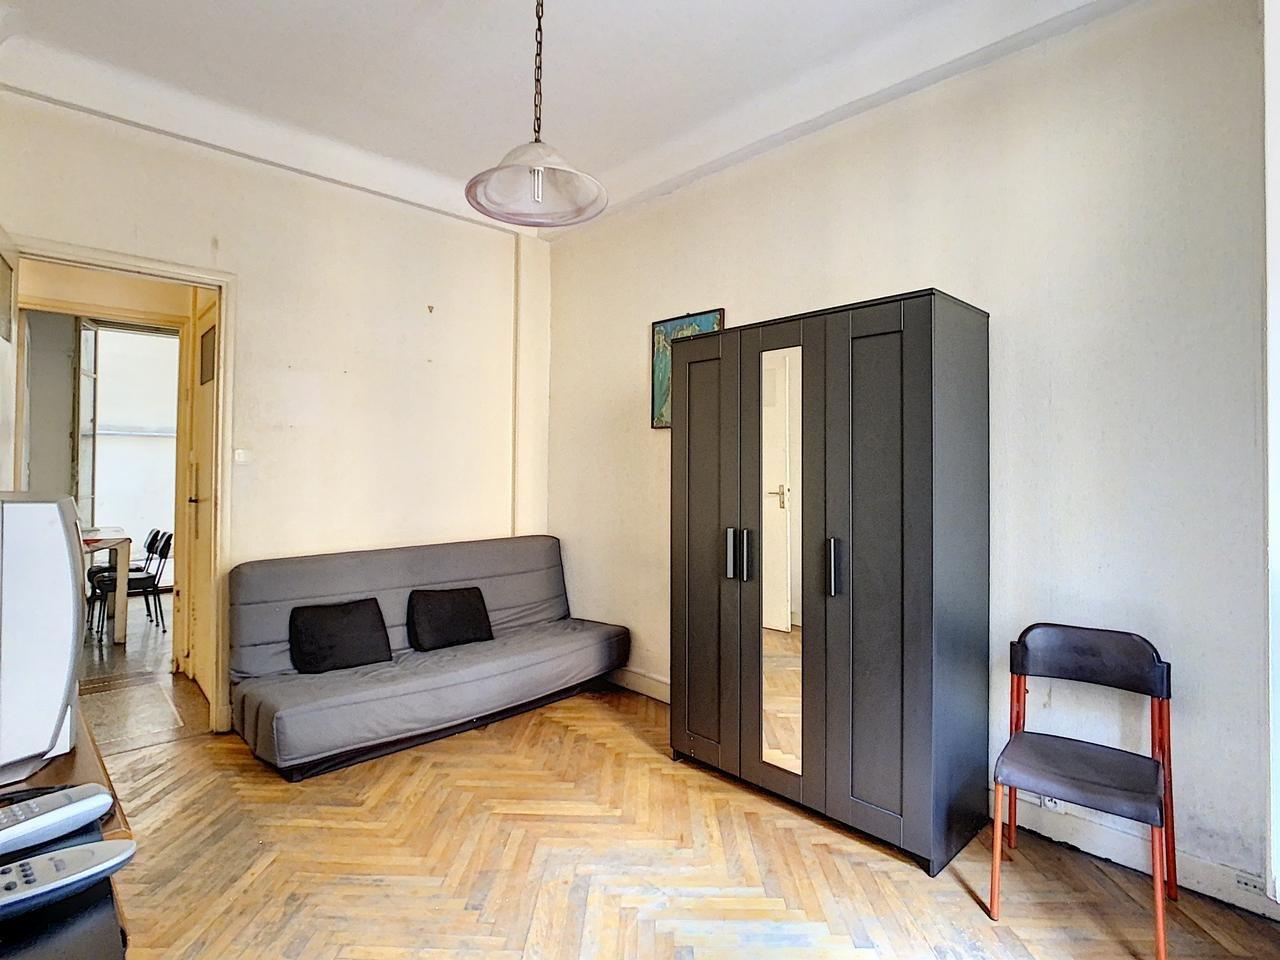 Appartement  2 Locali 39m2  In vendita   225000 €